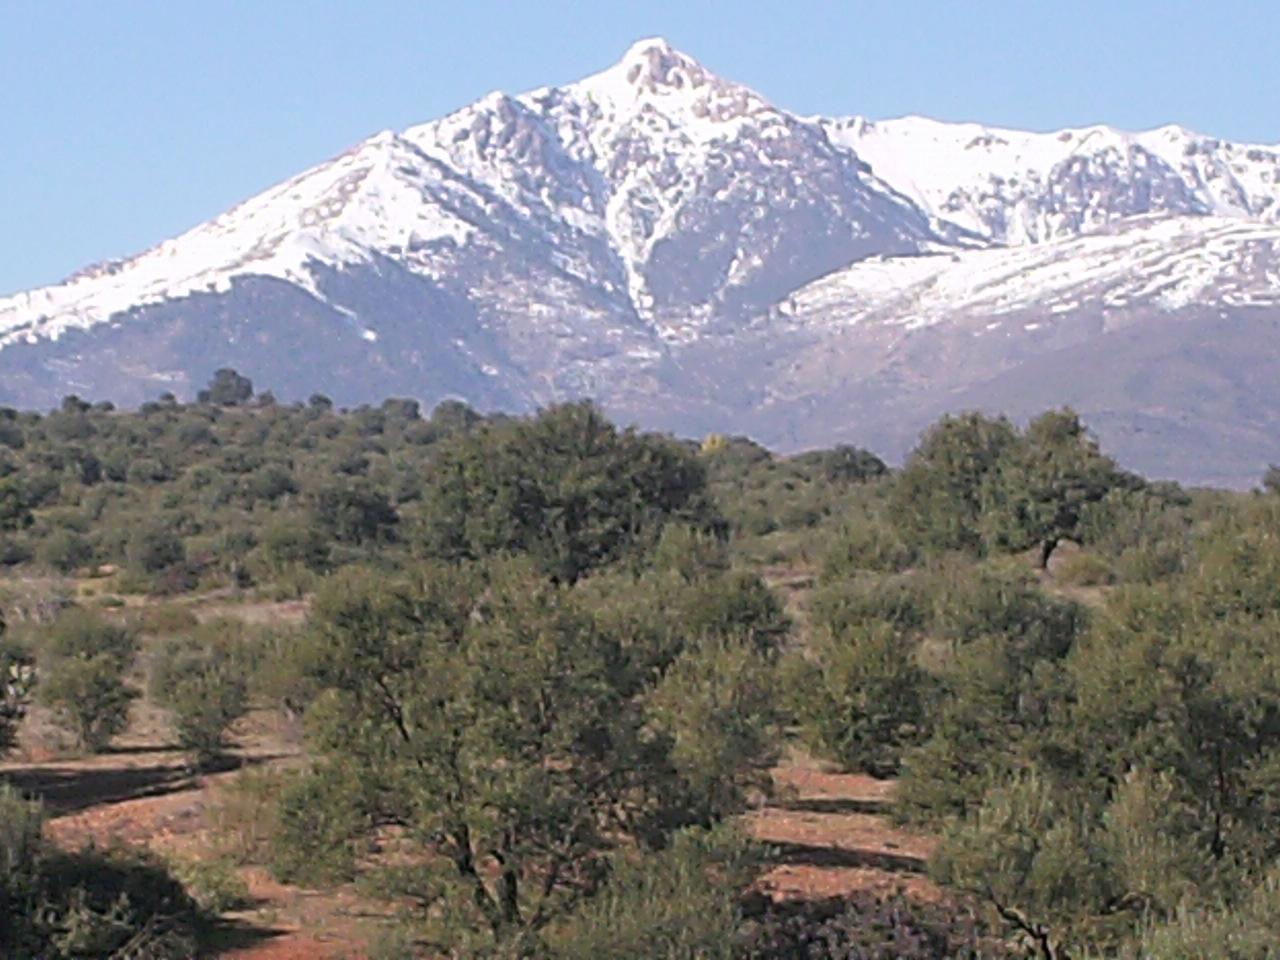 File:LALA KHEDIDJA.JPG - Wikimedia Commons